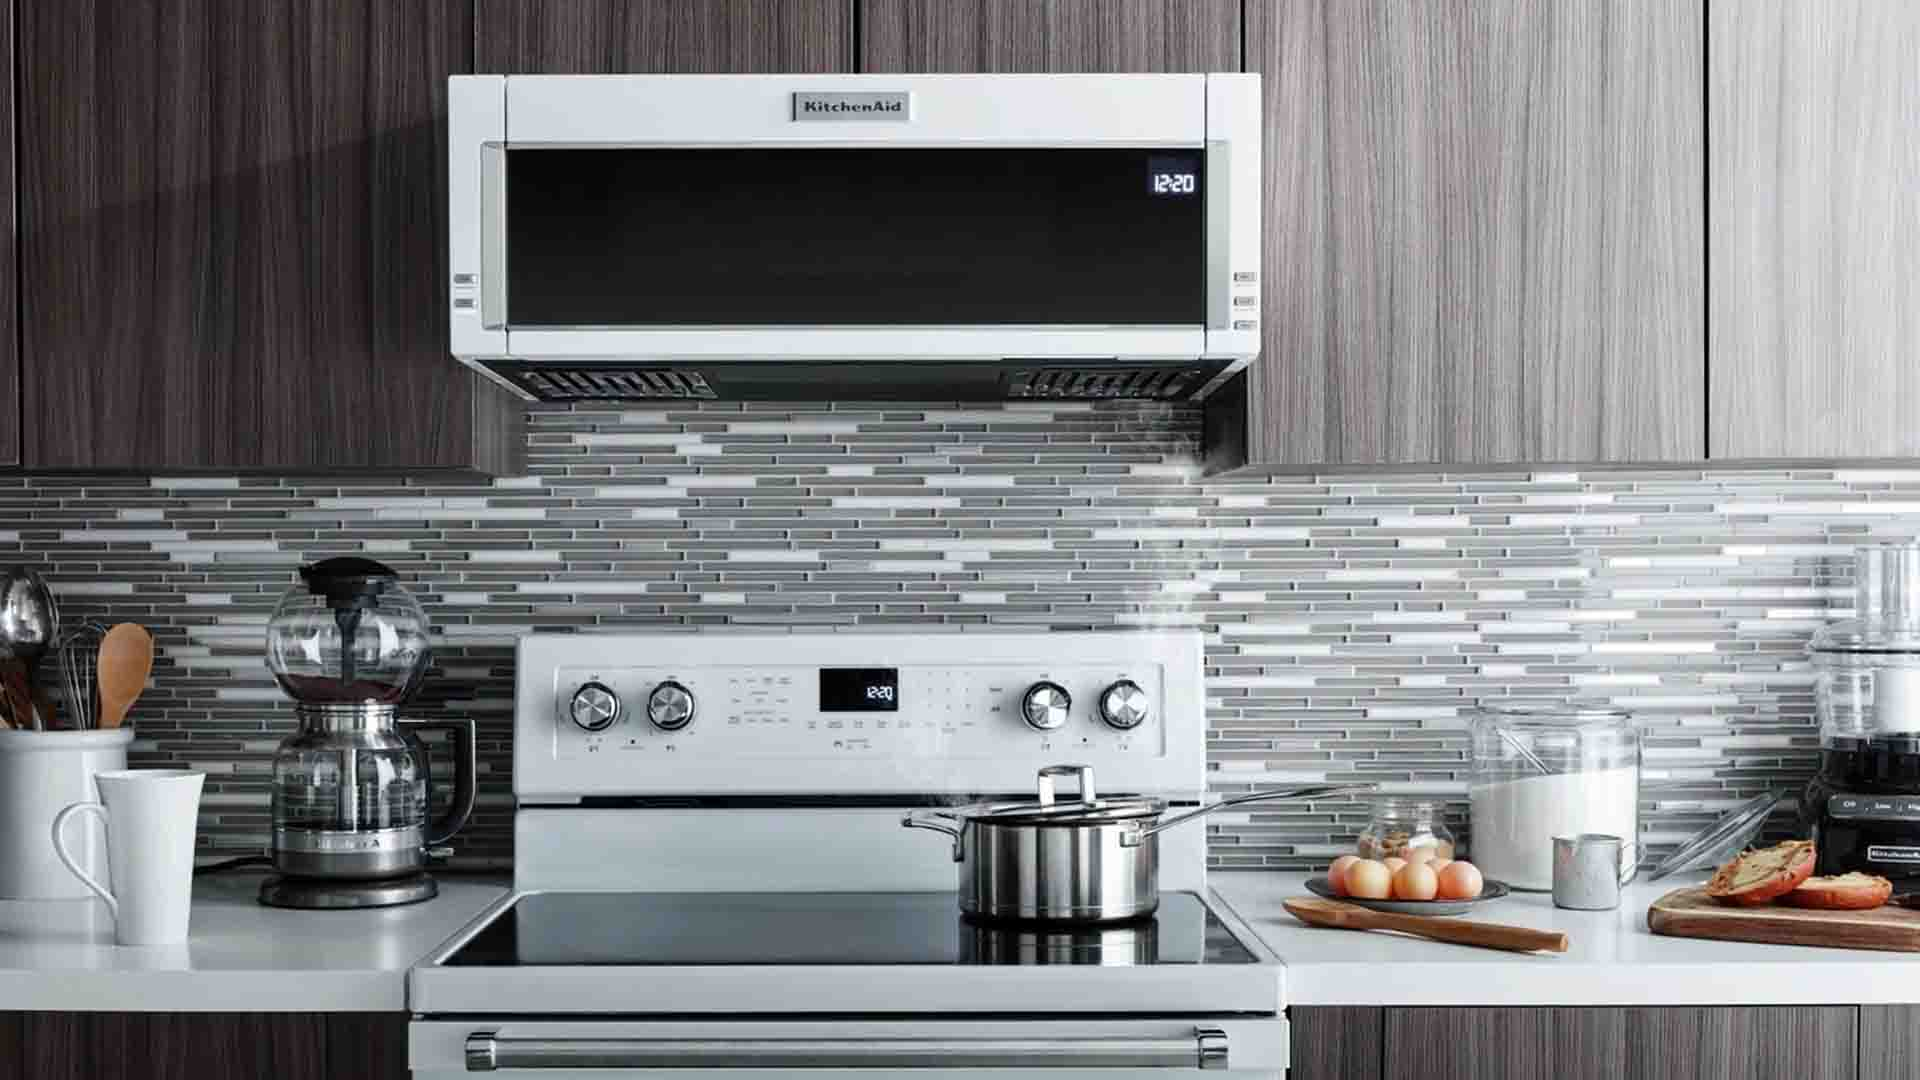 KitchenAid Microwave Hood Combination Repair | KitchenAid Repairs